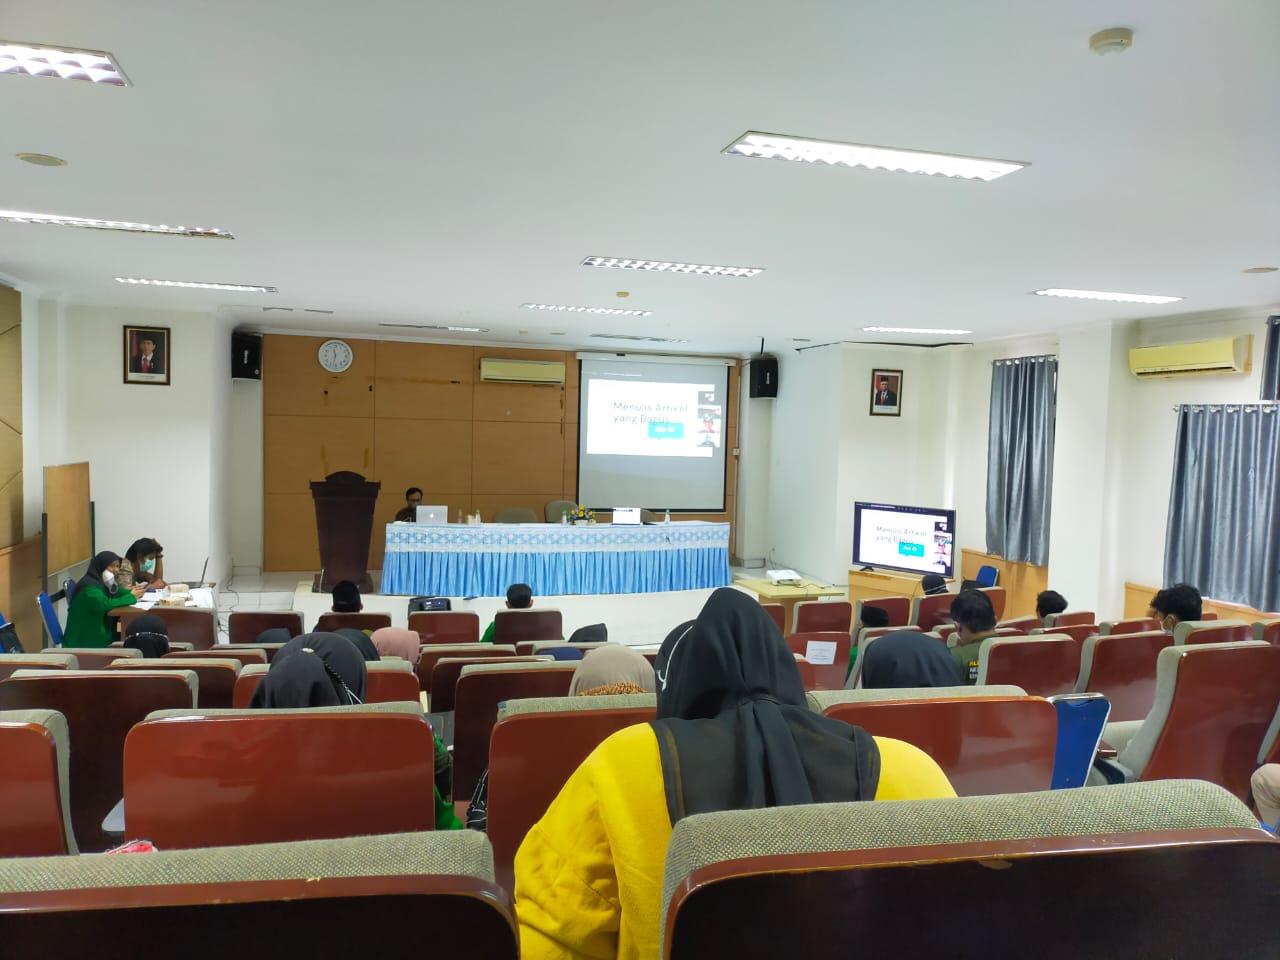 Gambar Prodi Aqidah dan Filsafat UIN Alauddin Gelar Workshop Penulisan Artikel Jurnal